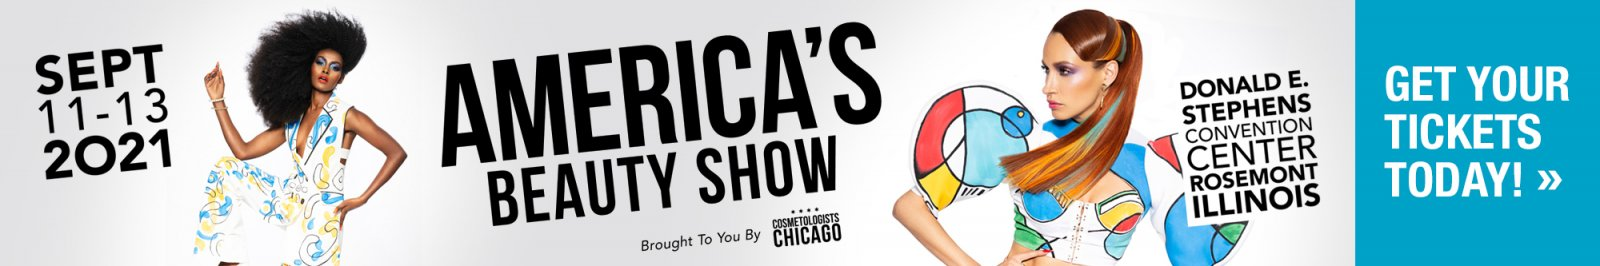 America's Beauty Show Tickets